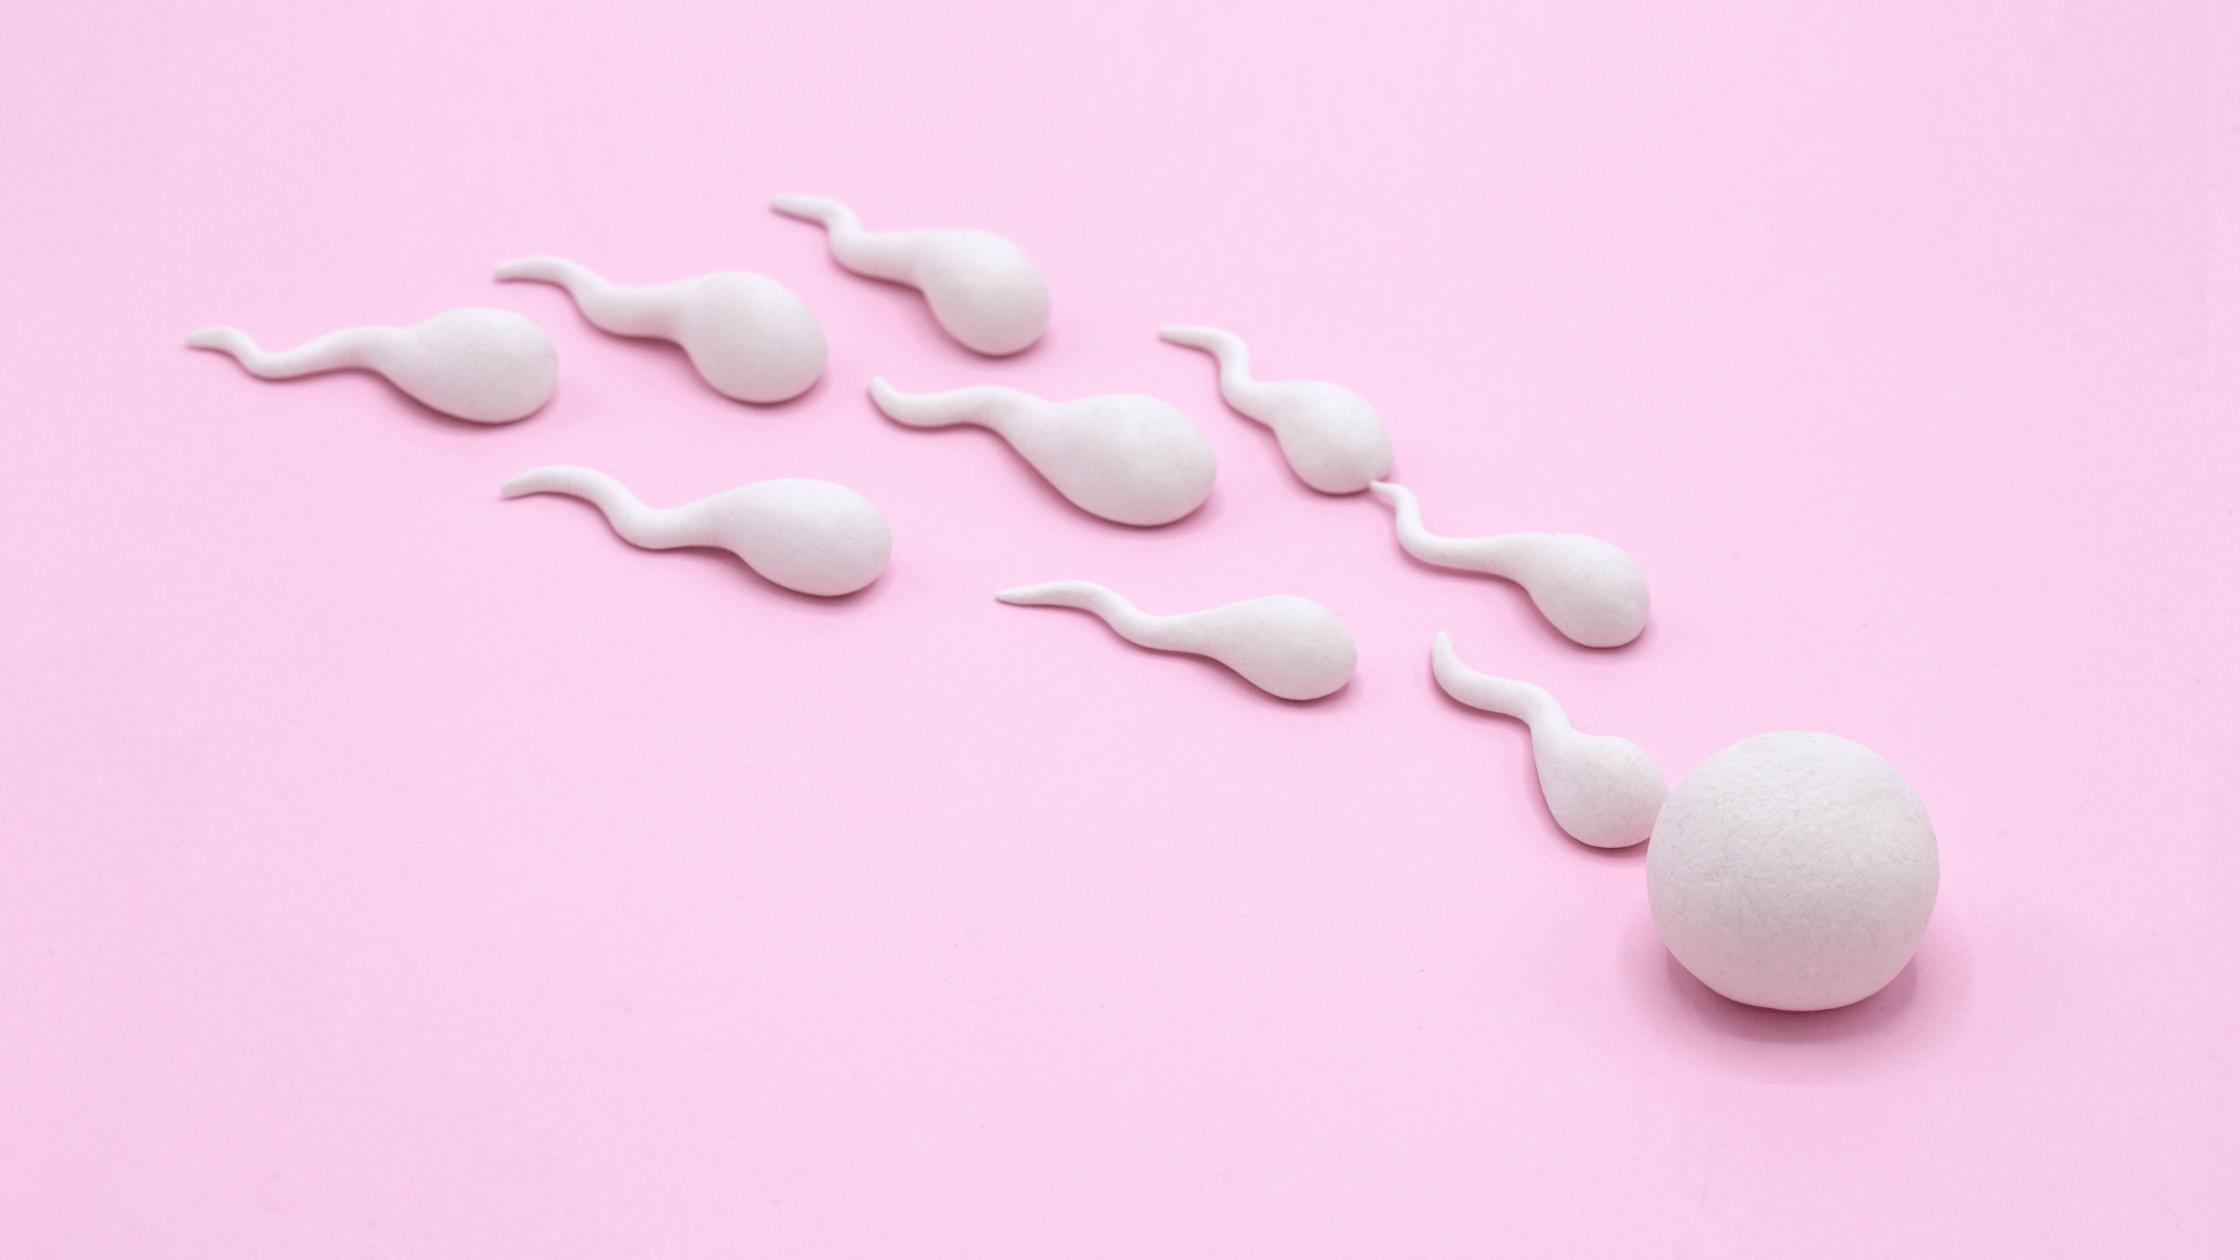 How long can sperm live inside a condom